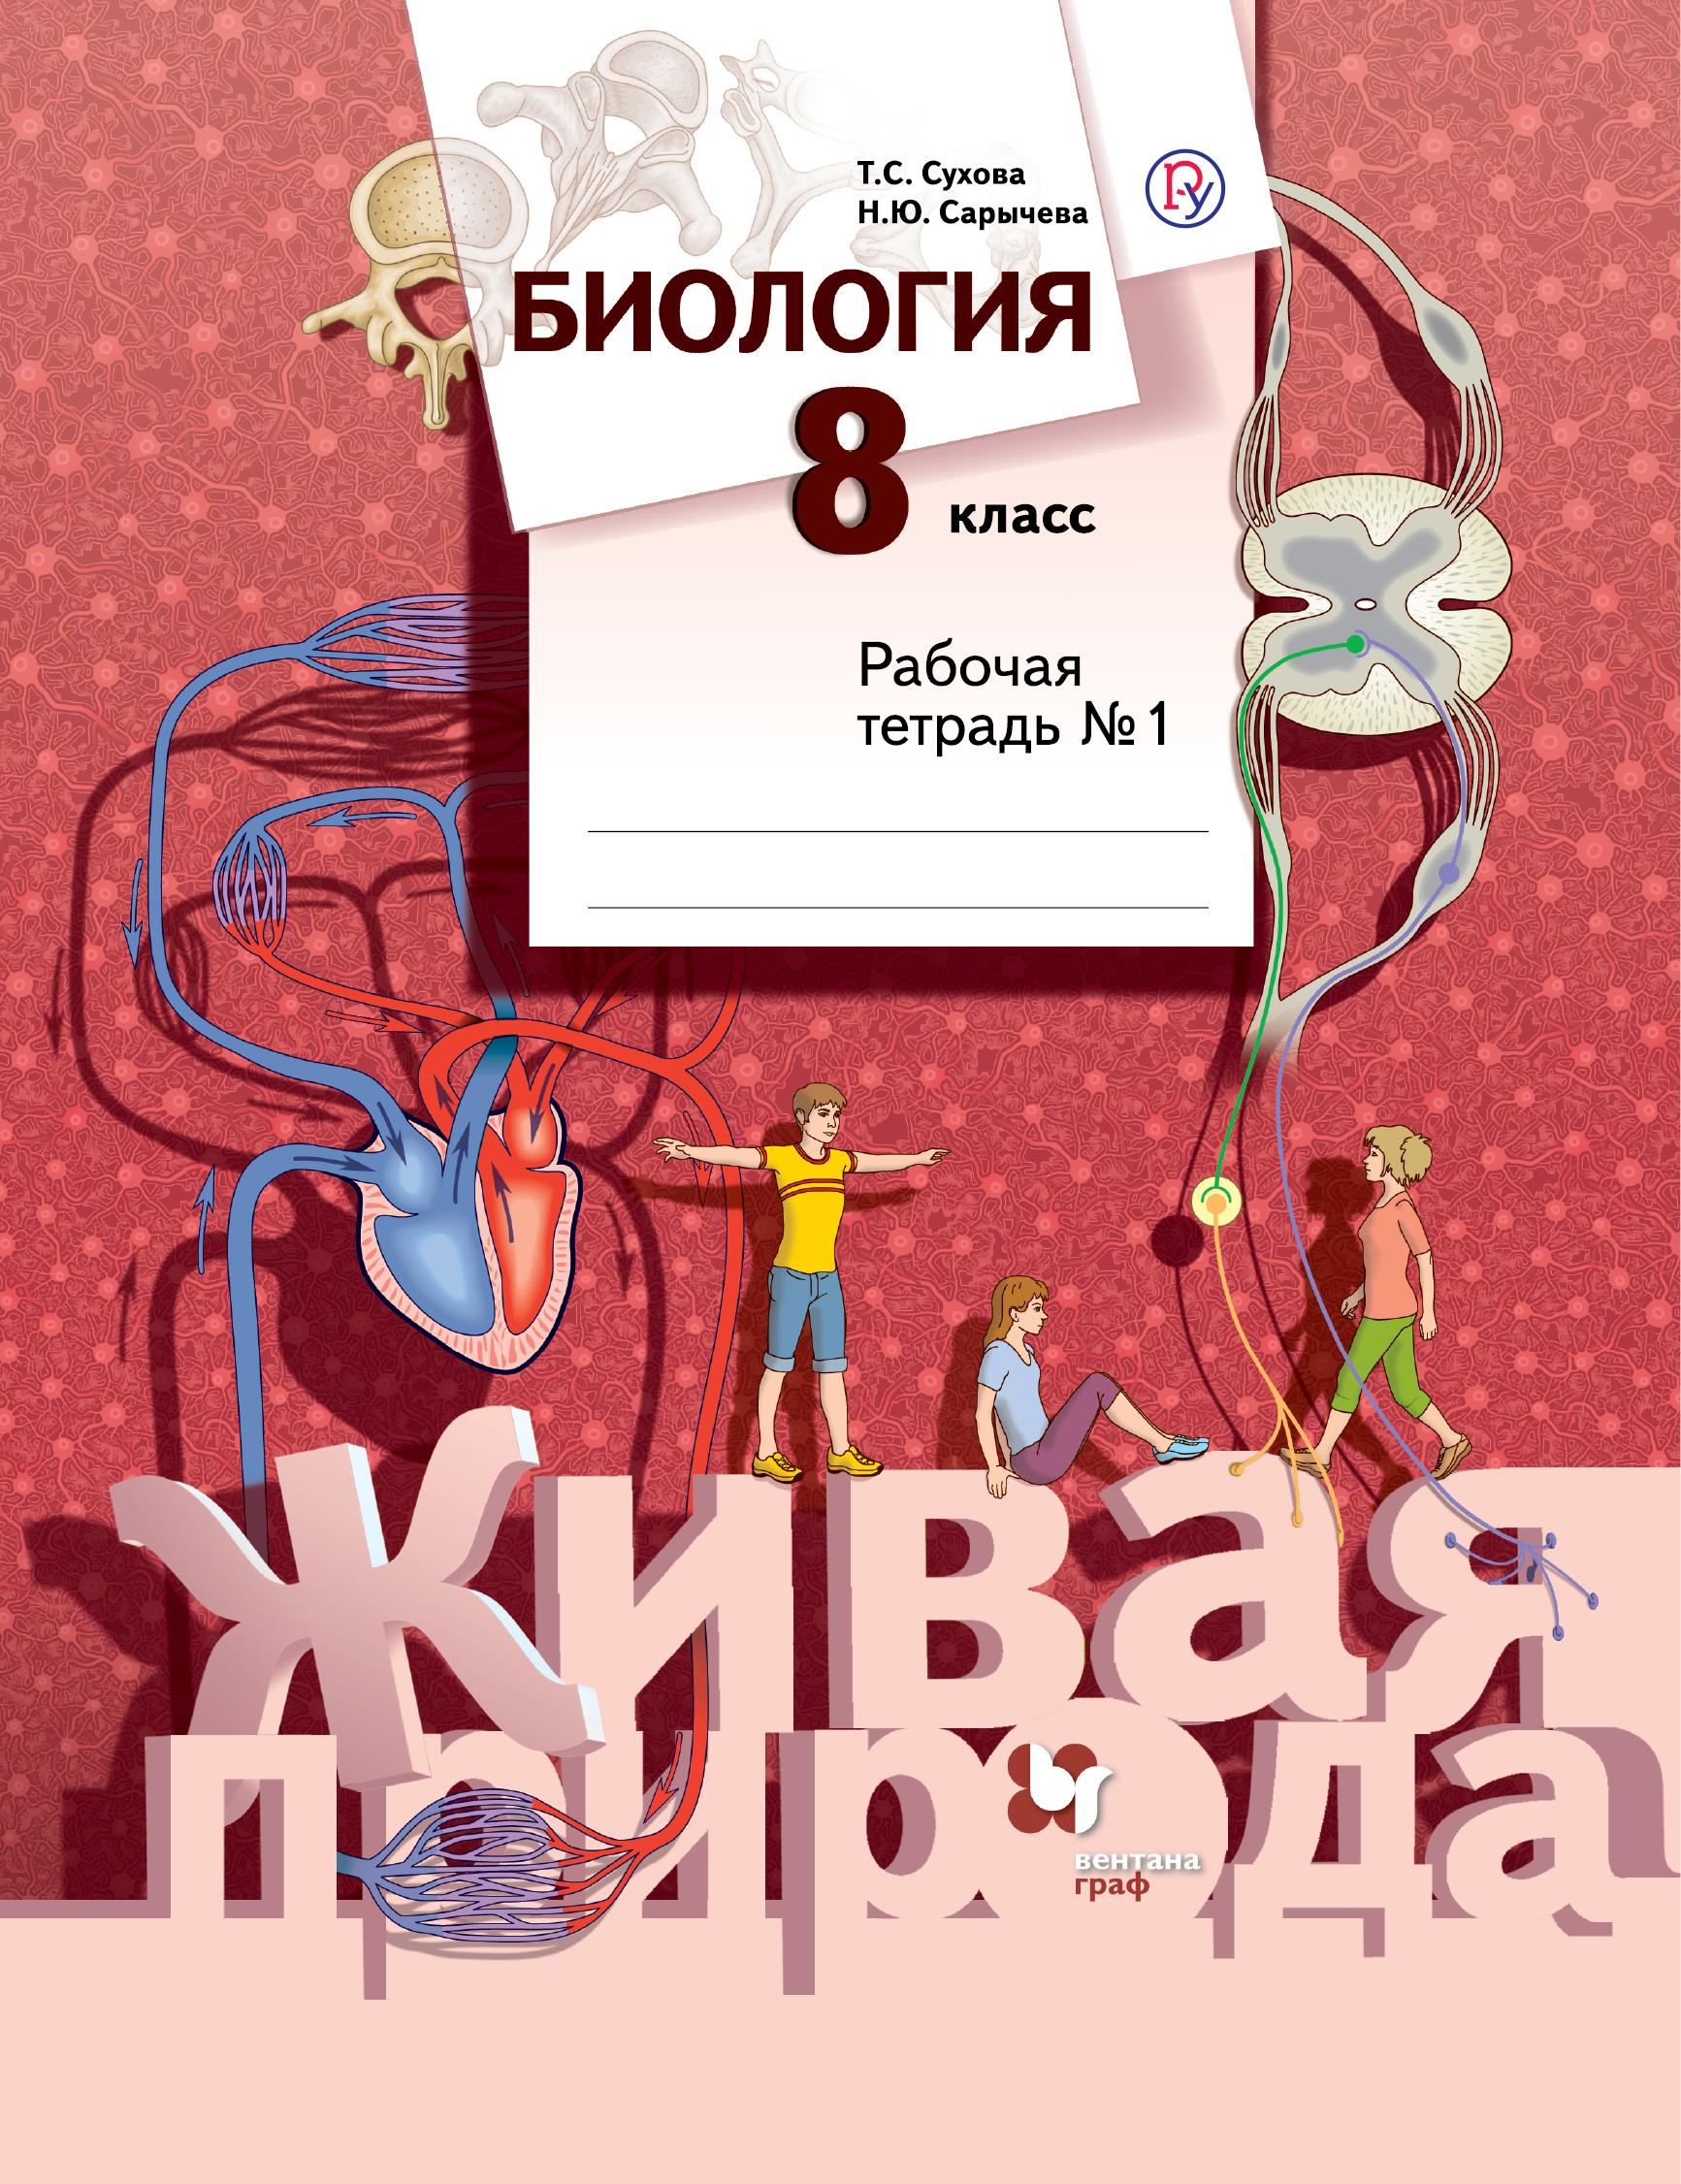 Биология. 8 класс. Рабочая тетрадь №1 ( Сухова Т.С., Сарычева Н.Ю.  )